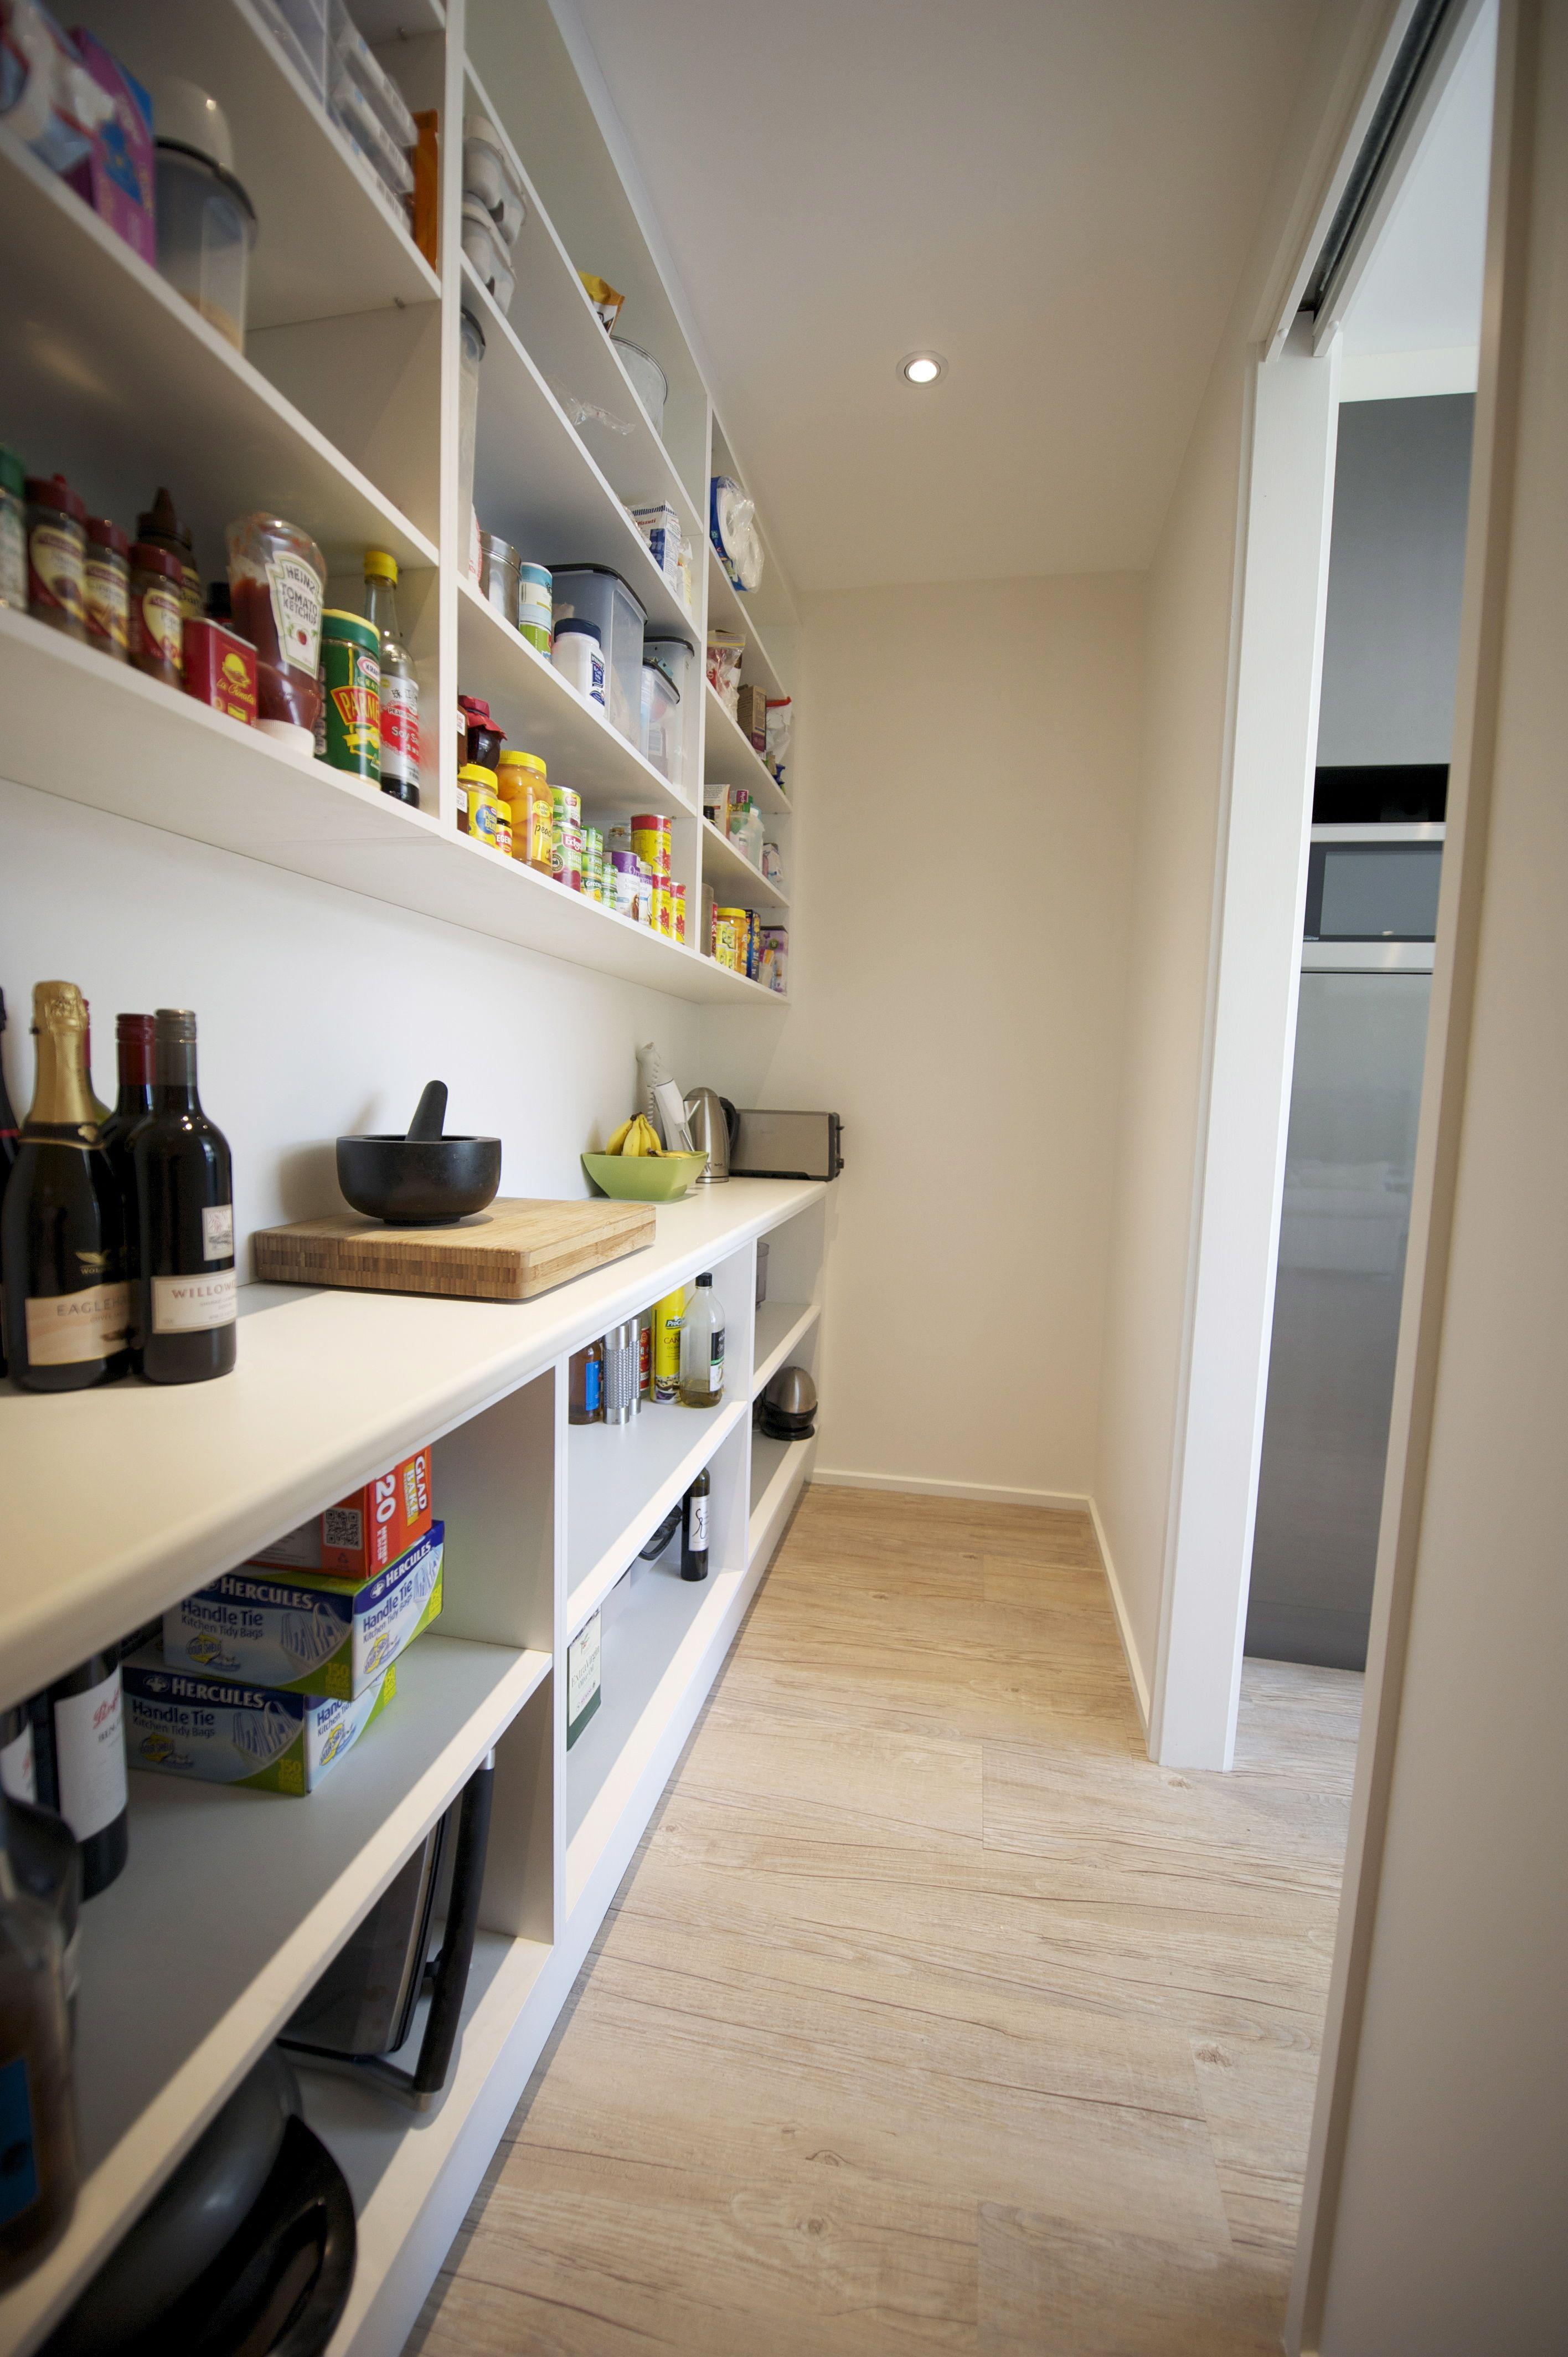 Pin By Elize Botha On Inspiration Walk In Pantry Butlers Pantry Pantry Layout Modern Kitchen Pantry Kitchen Pantry Design